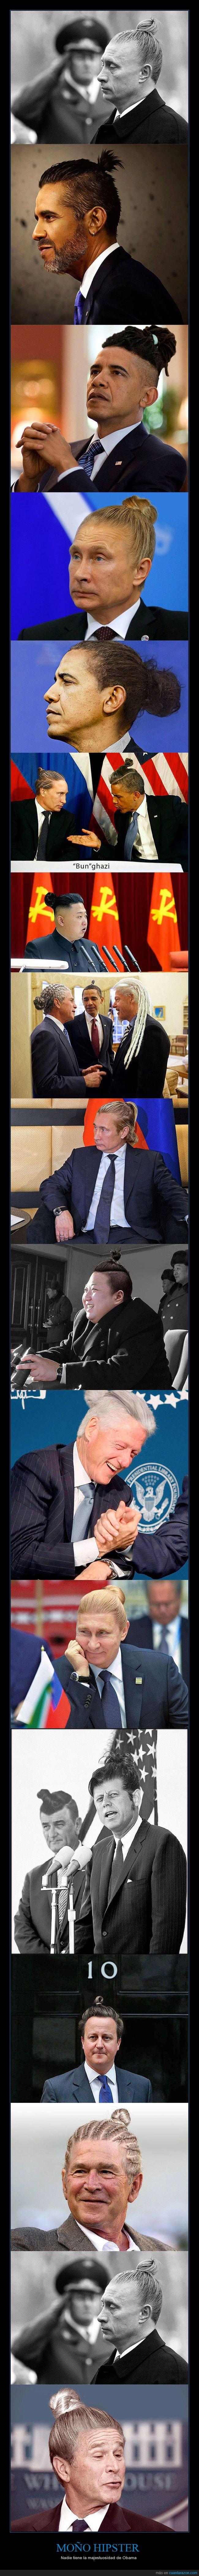 hipsters,líderes mundiales,moño,peinado